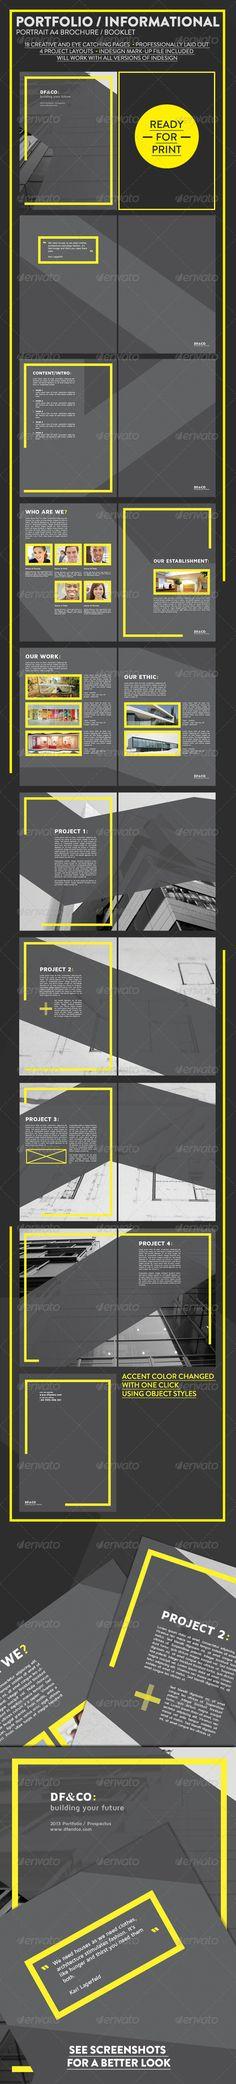 Modern Portfolio and Informational Brochure